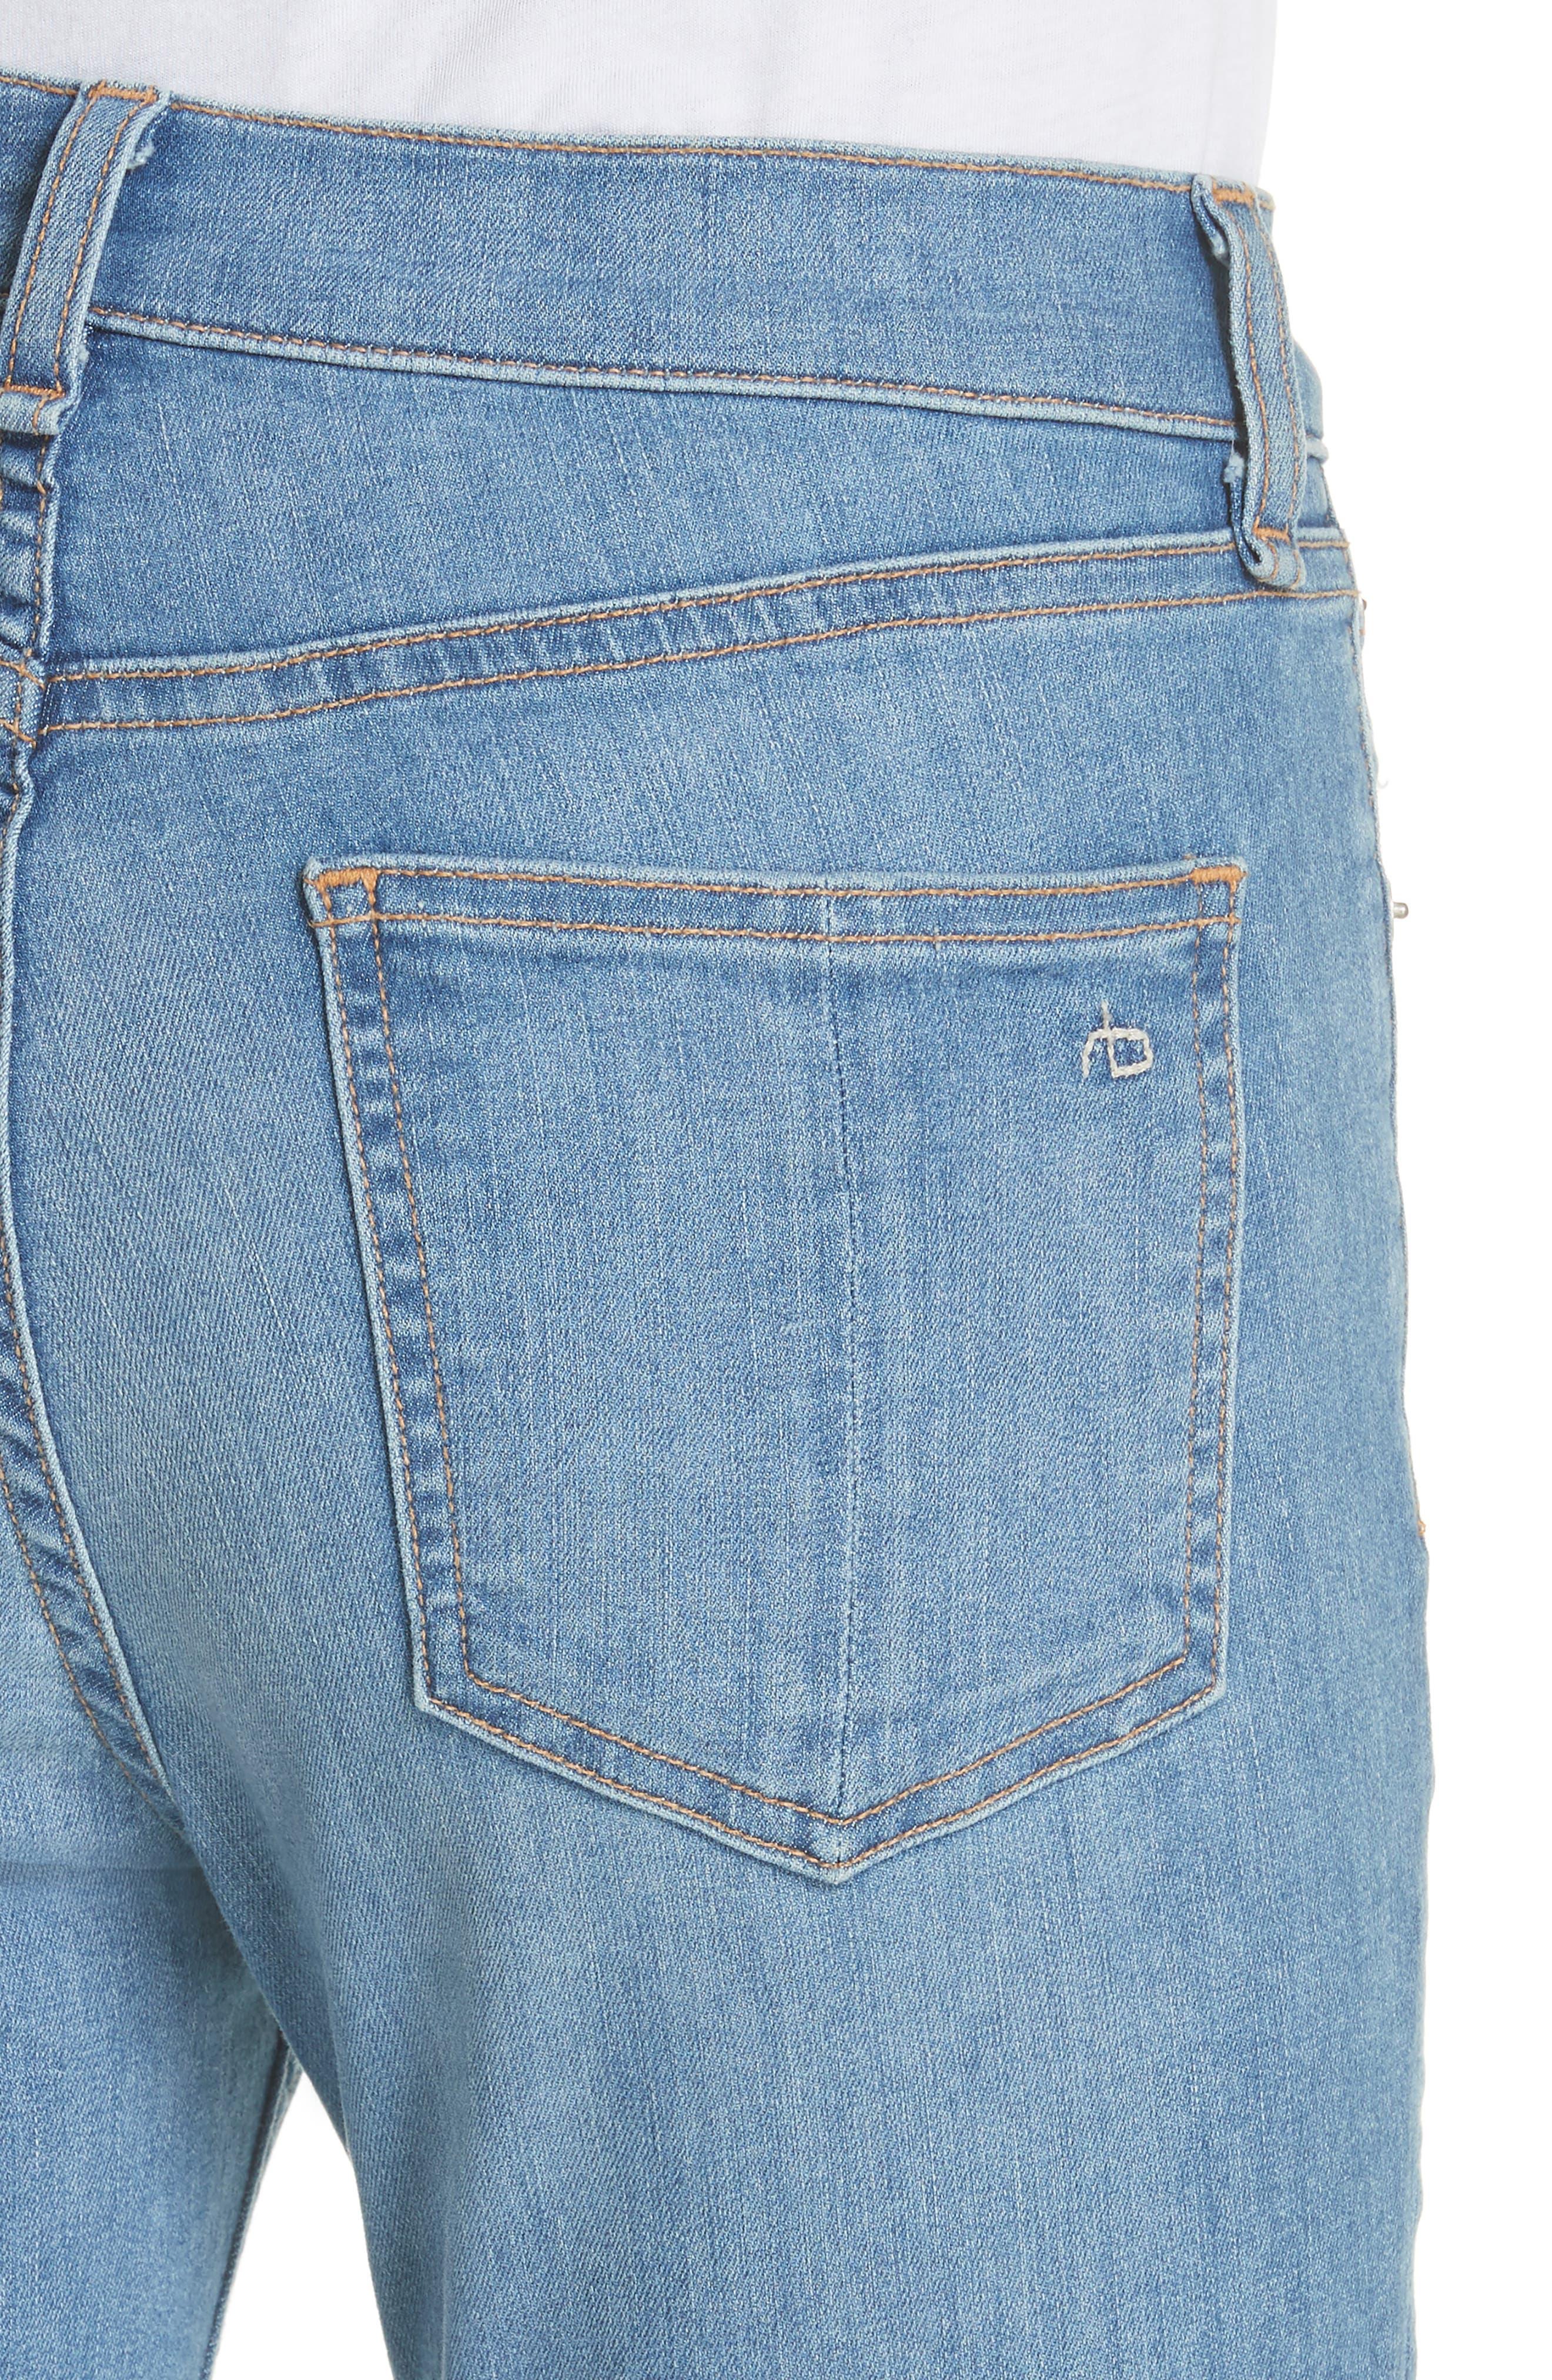 High Waist Skinny Jeans,                             Alternate thumbnail 4, color,                             Alibi